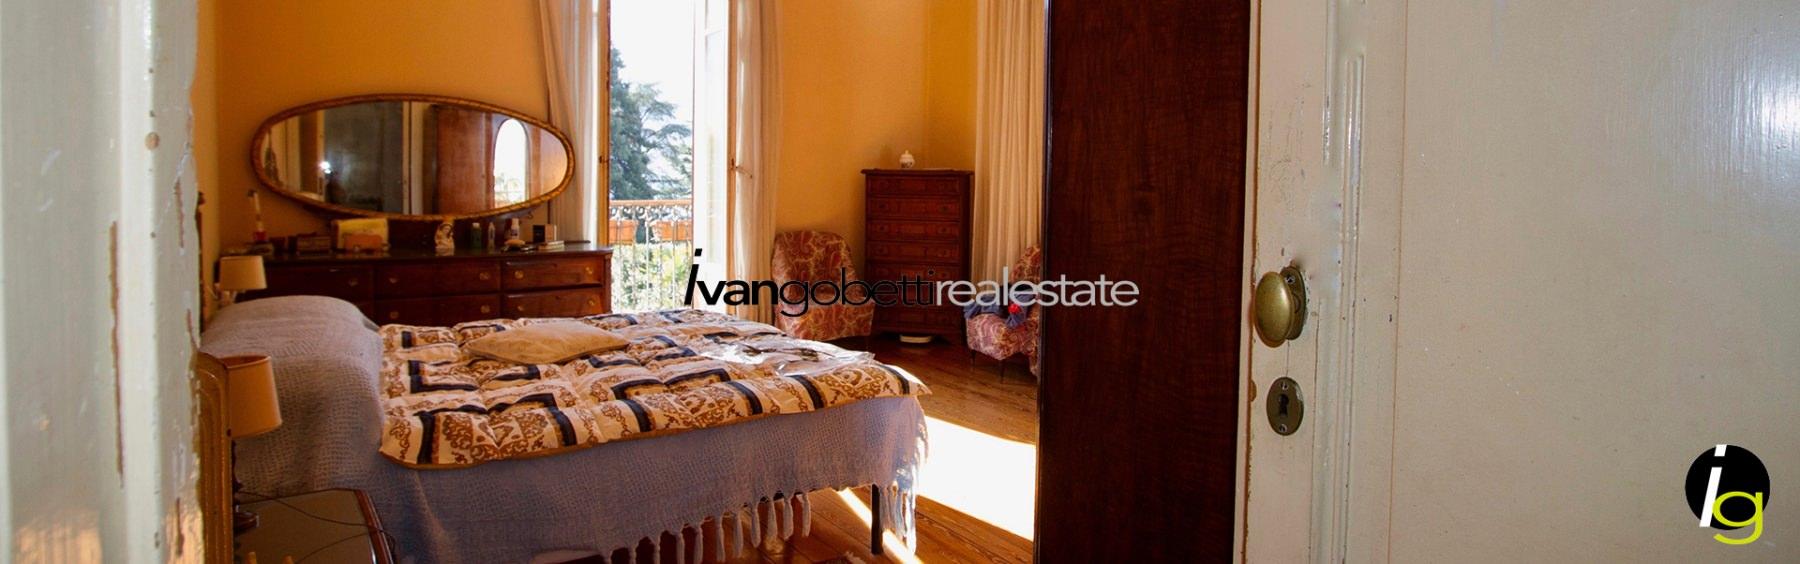 Lake Como, Mezzegra villa for sale with view